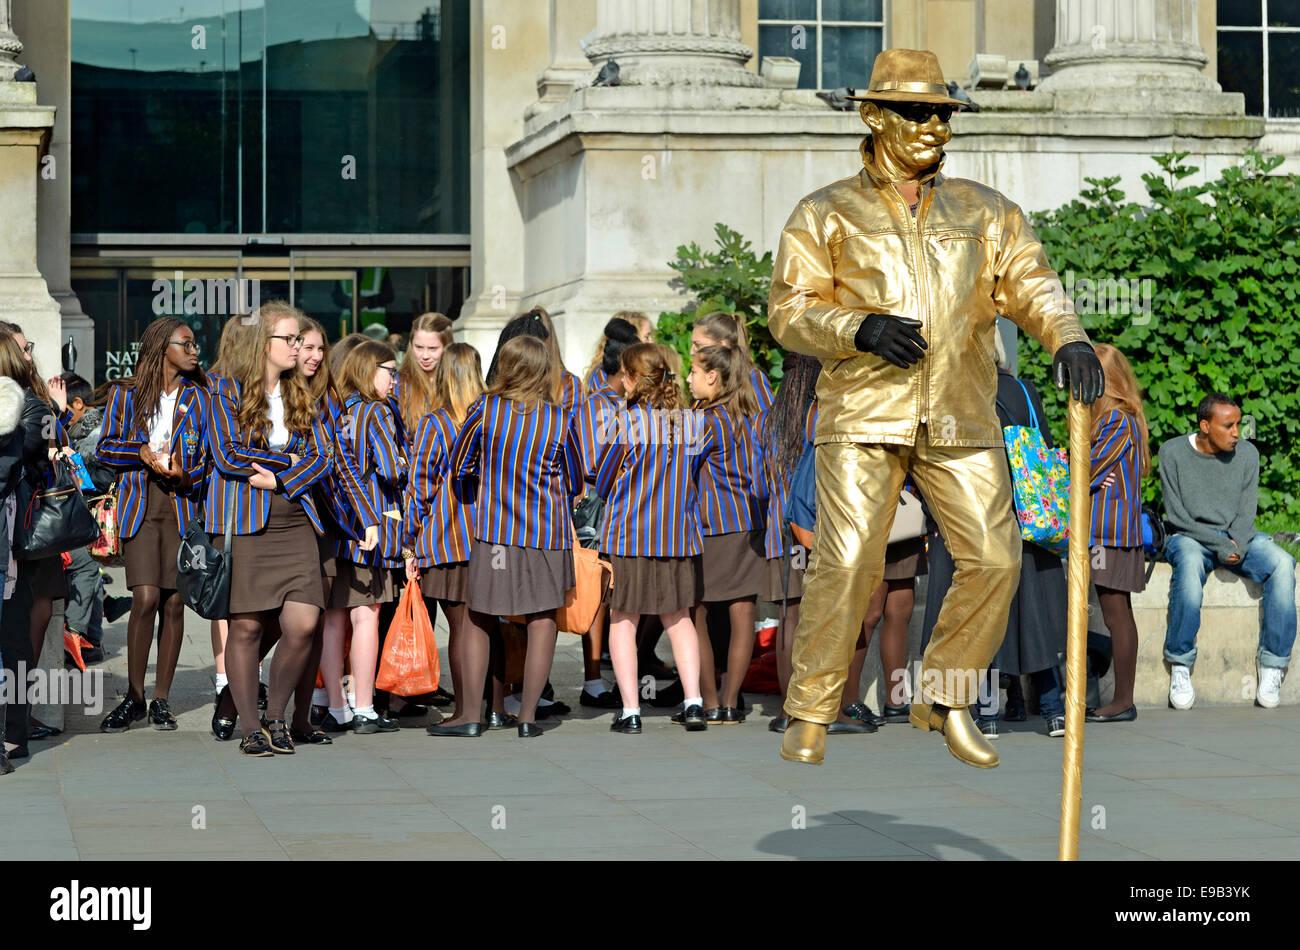 "Londres, Inglaterra, Reino Unido. Estatua humana ""flotante"" y un grupo de niñas en un viaje en Trafalgar Imagen De Stock"